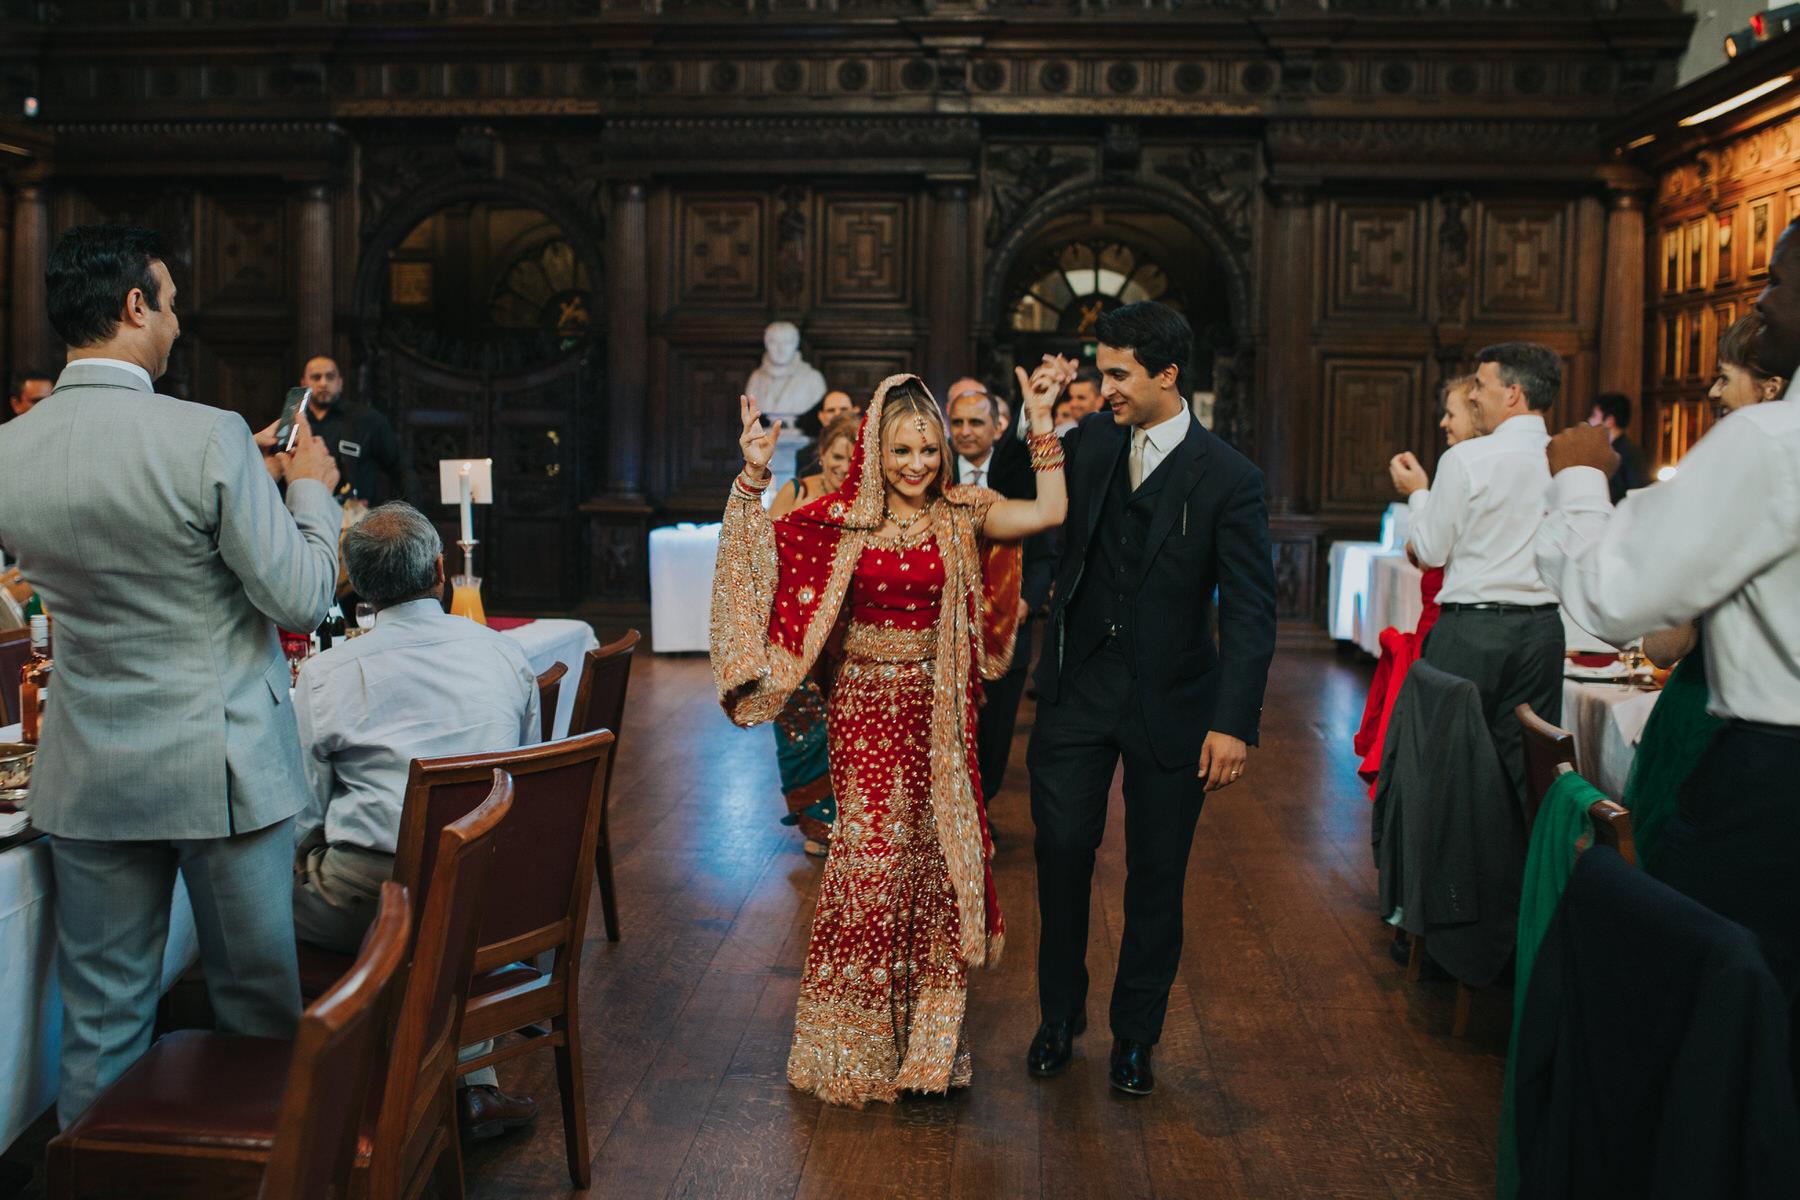 174-Anglo-Asian-wedding-groom-leads-bride-red-sari.jpg